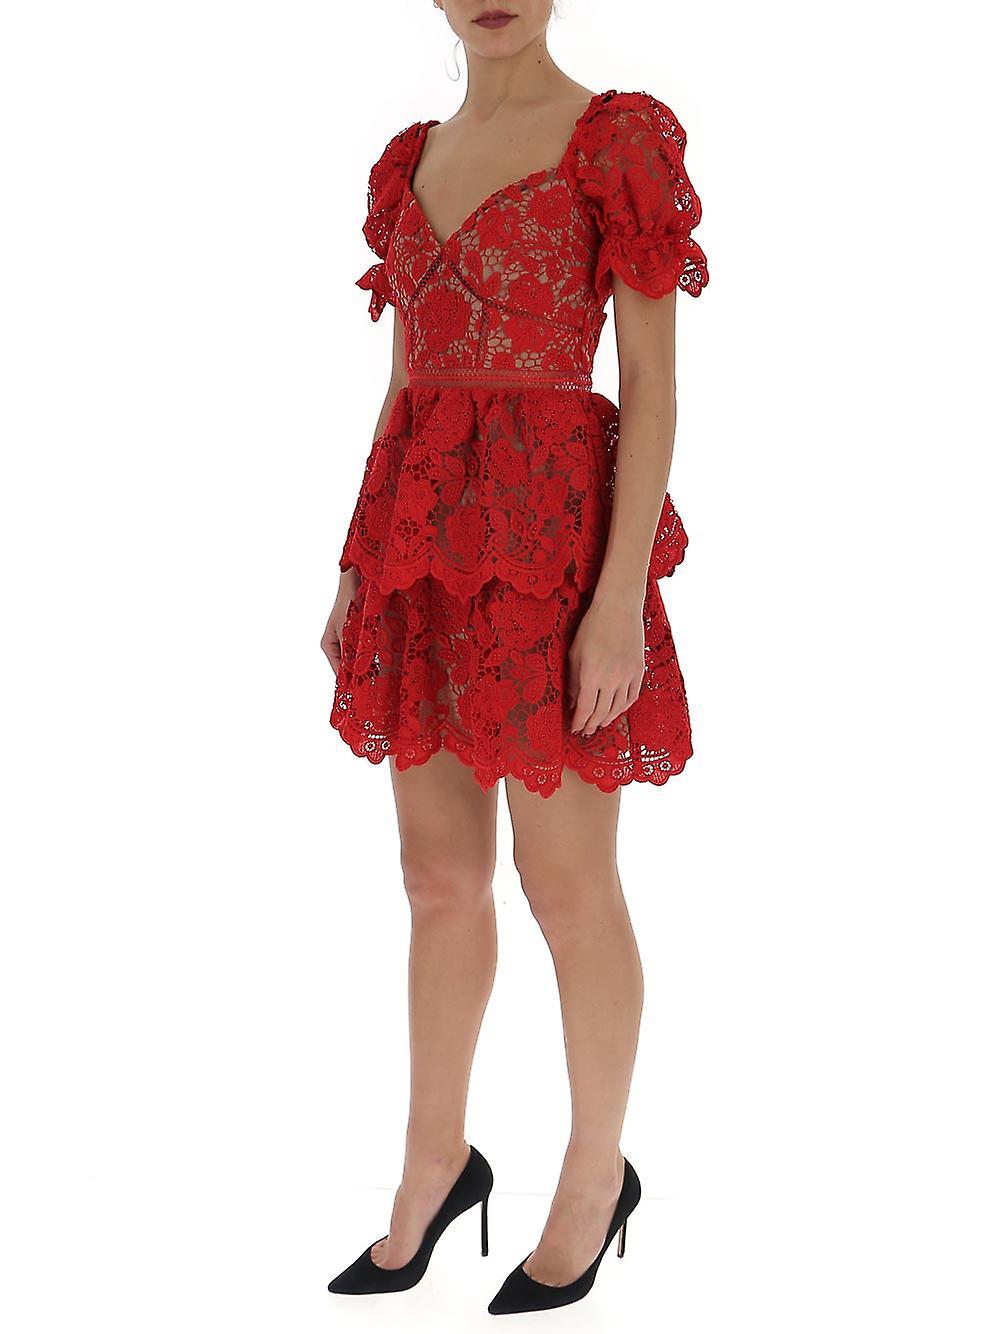 Autoportrait Rs20113sfuchsia Women-apos;s Red Polyester Dress r2frN2